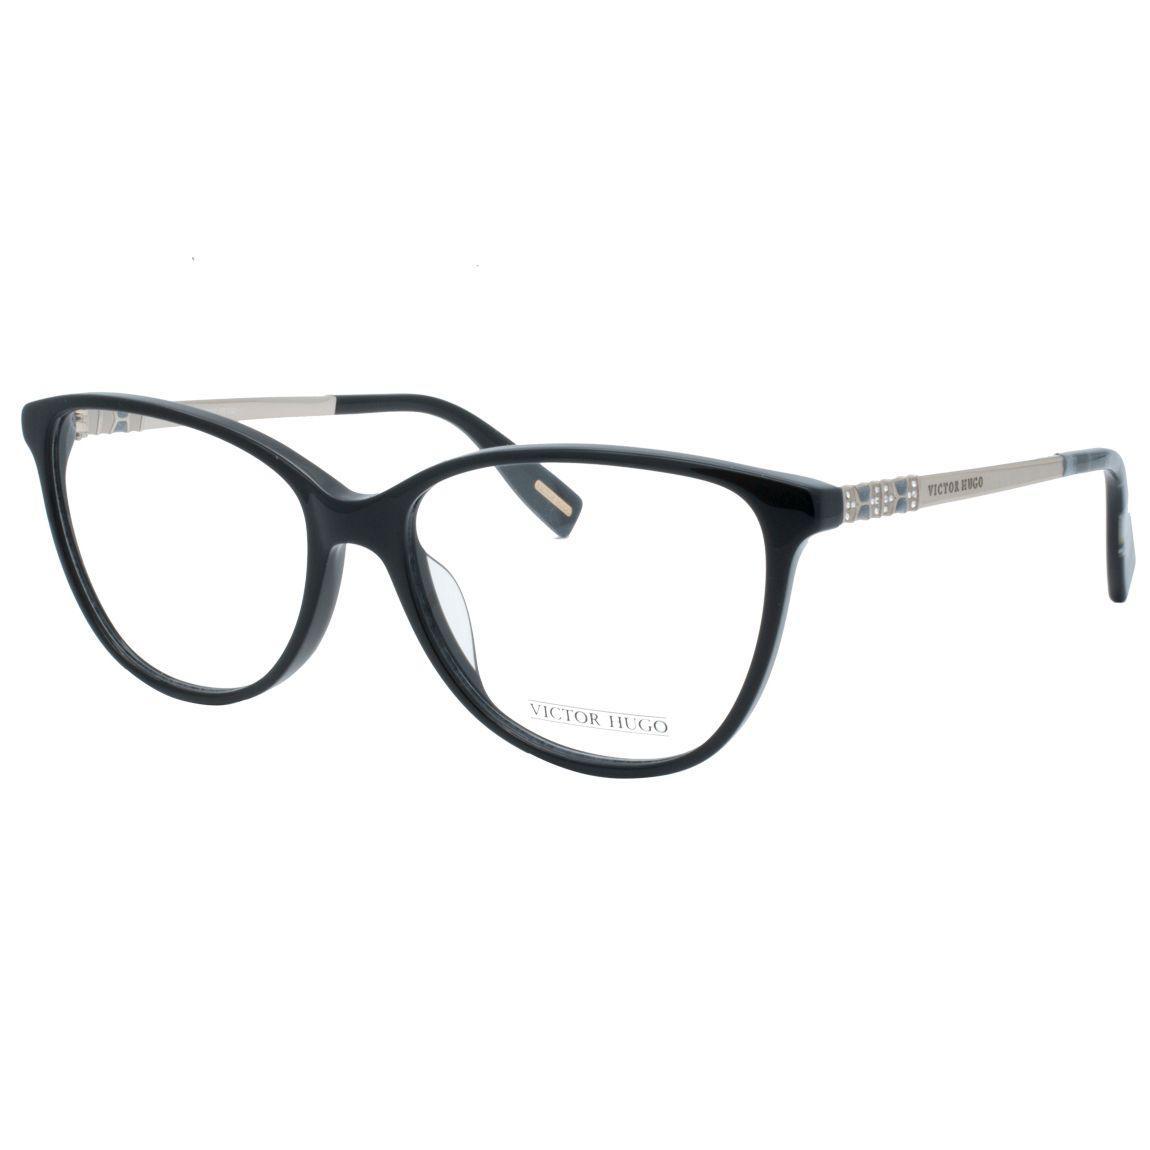 c85b6179f8f3d Óculos de Grau Victor Hugo Feminino VH1773S 0700 - Acetato Preto e Metal  Bronze R  931